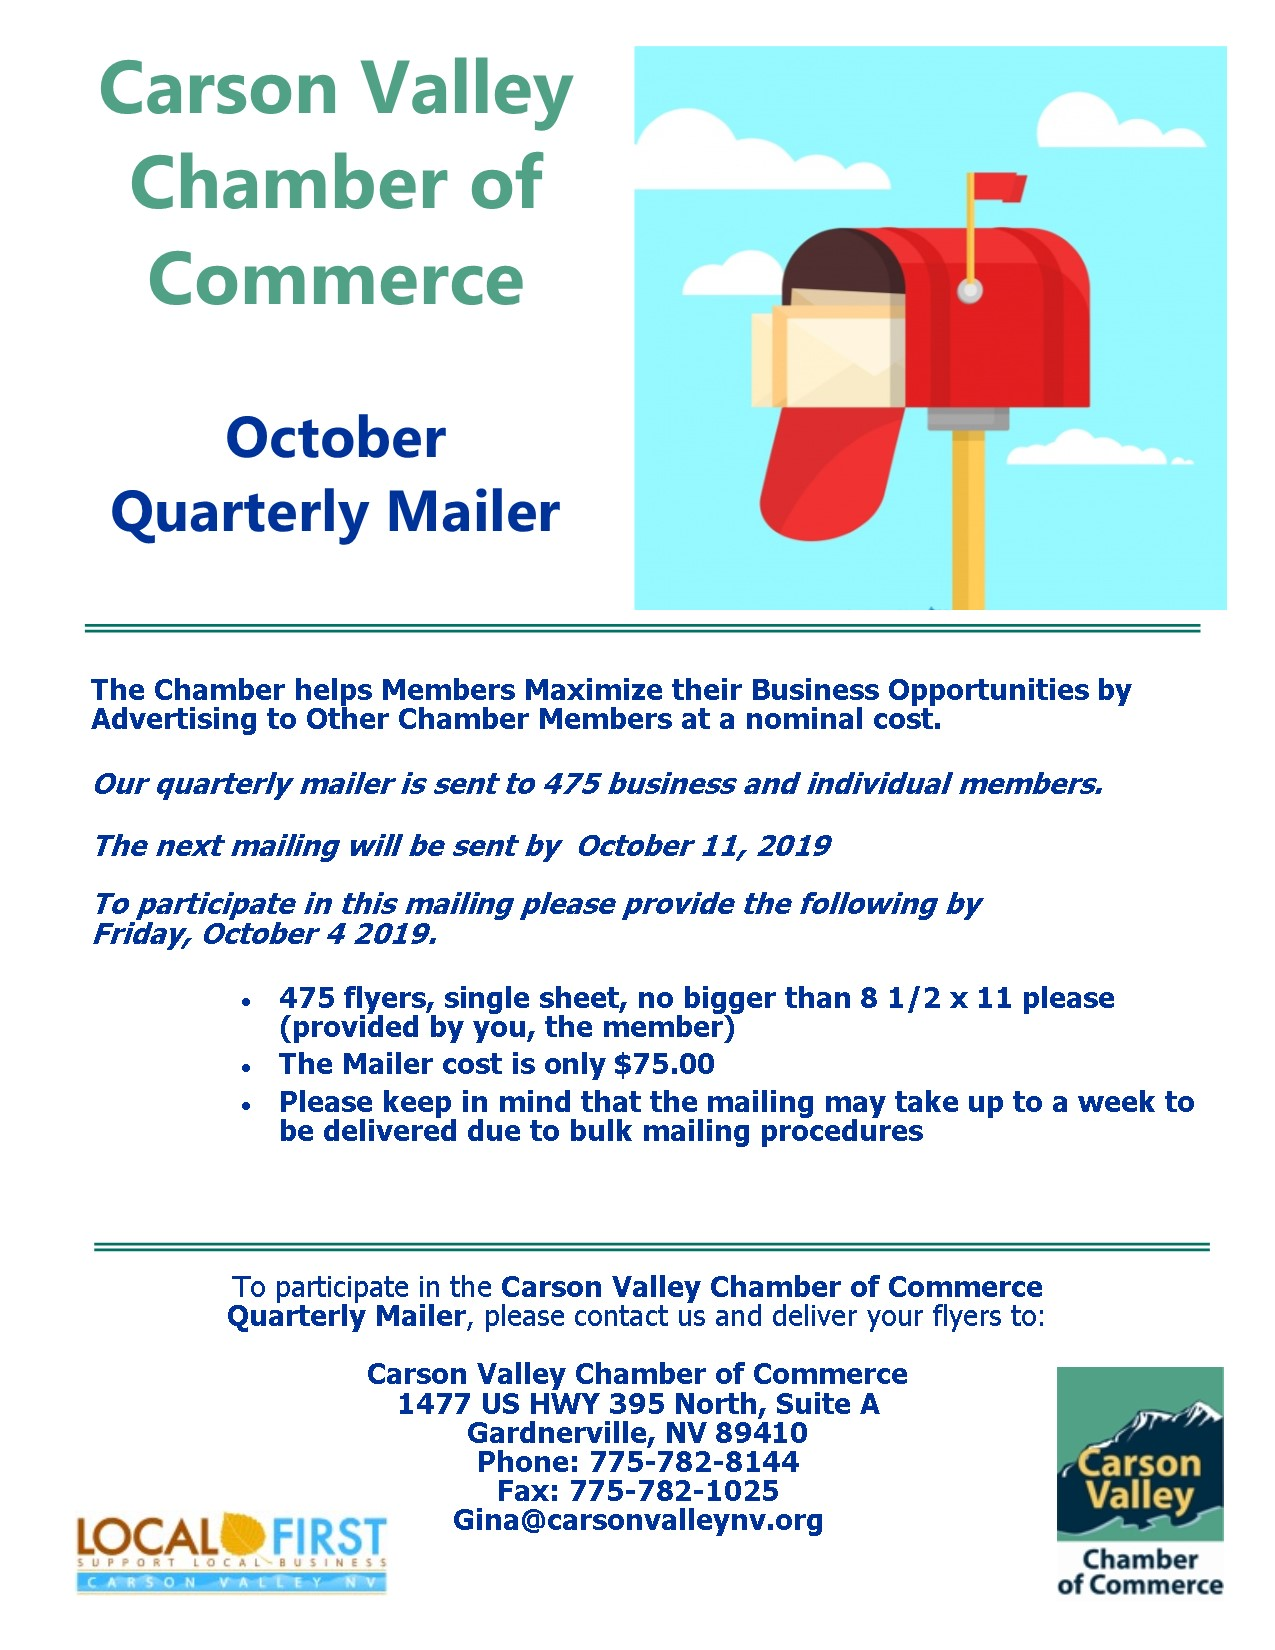 October-Quarterly-Mailer-Flyer-2019.jpg